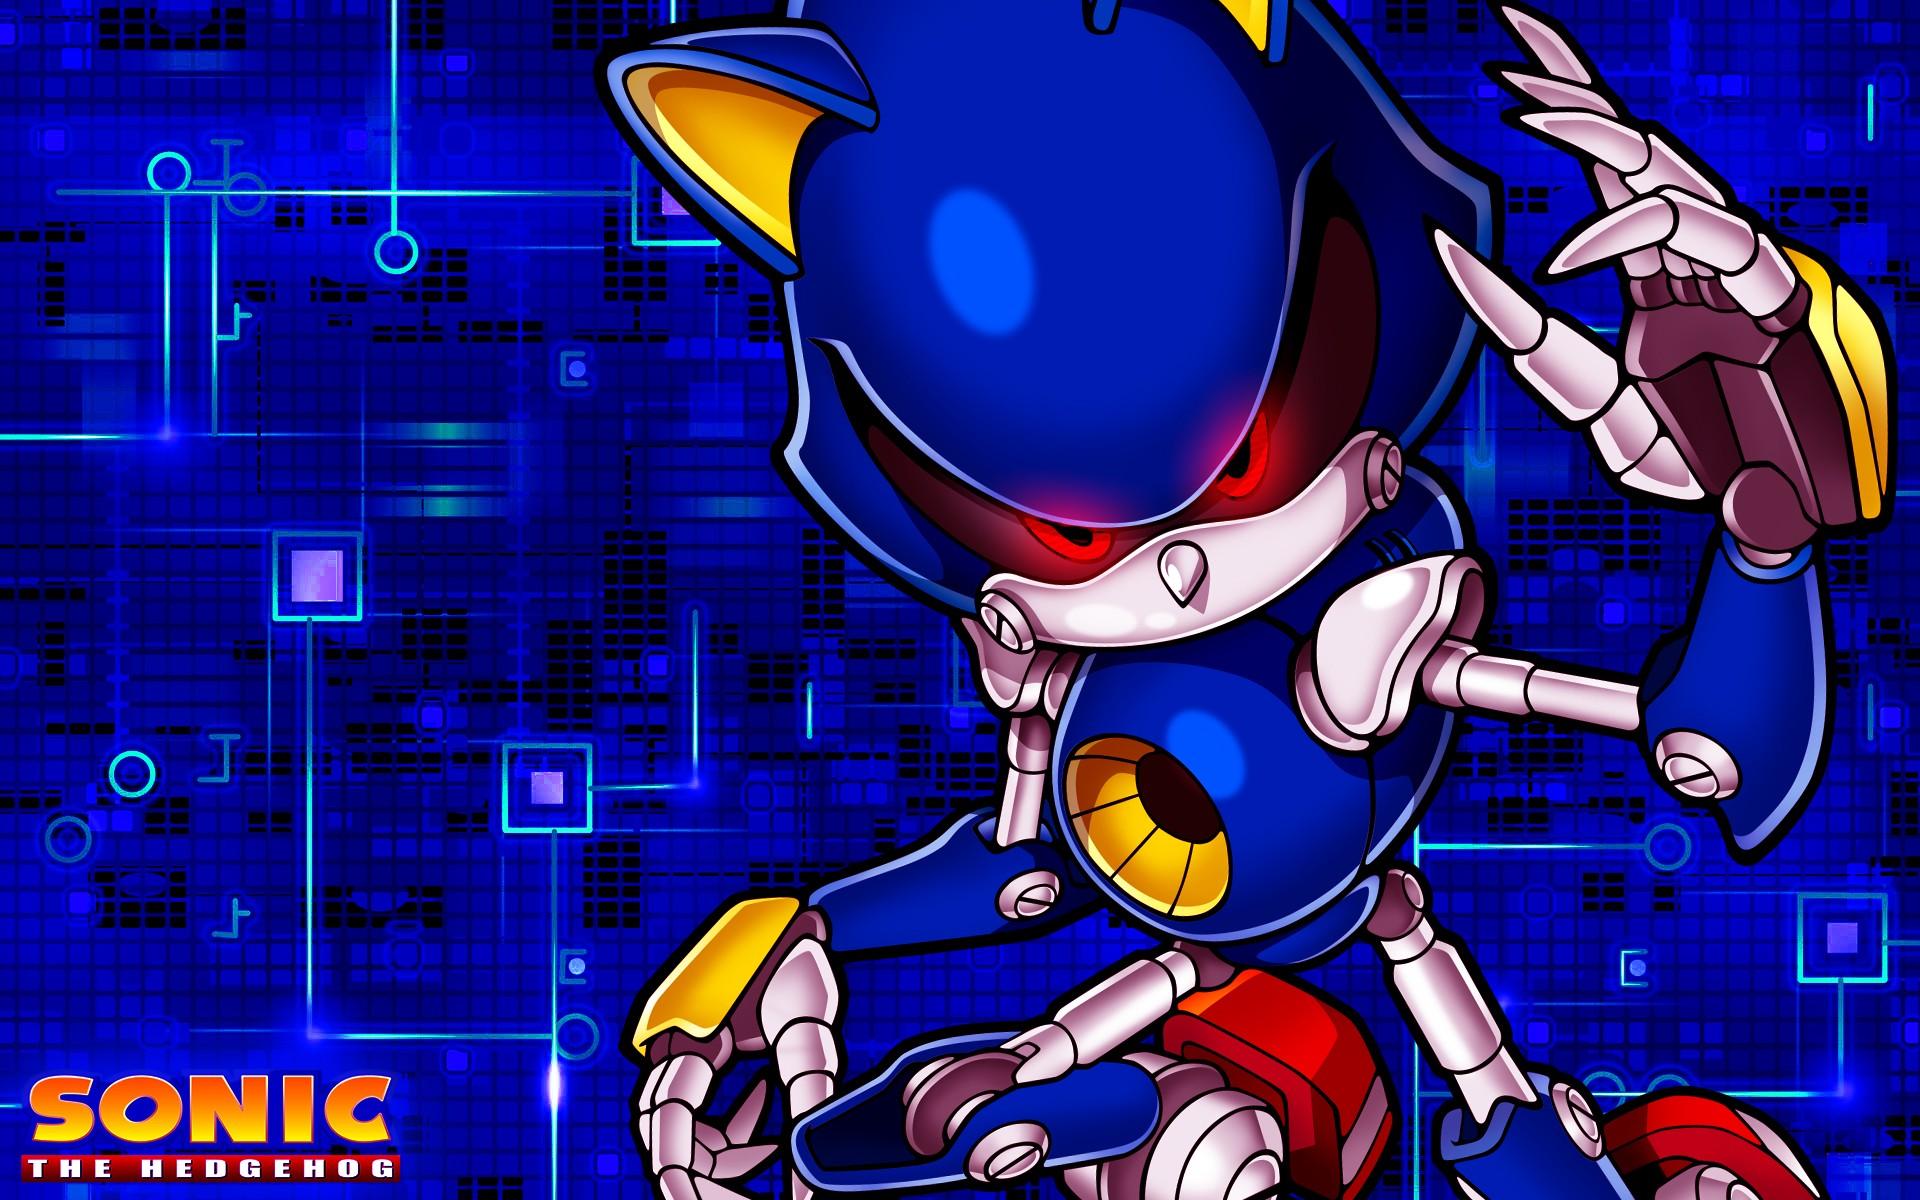 Hd Wallpaper Sonic Sonic The Hedgehog 2020 Sonic The Hedgehog Hd